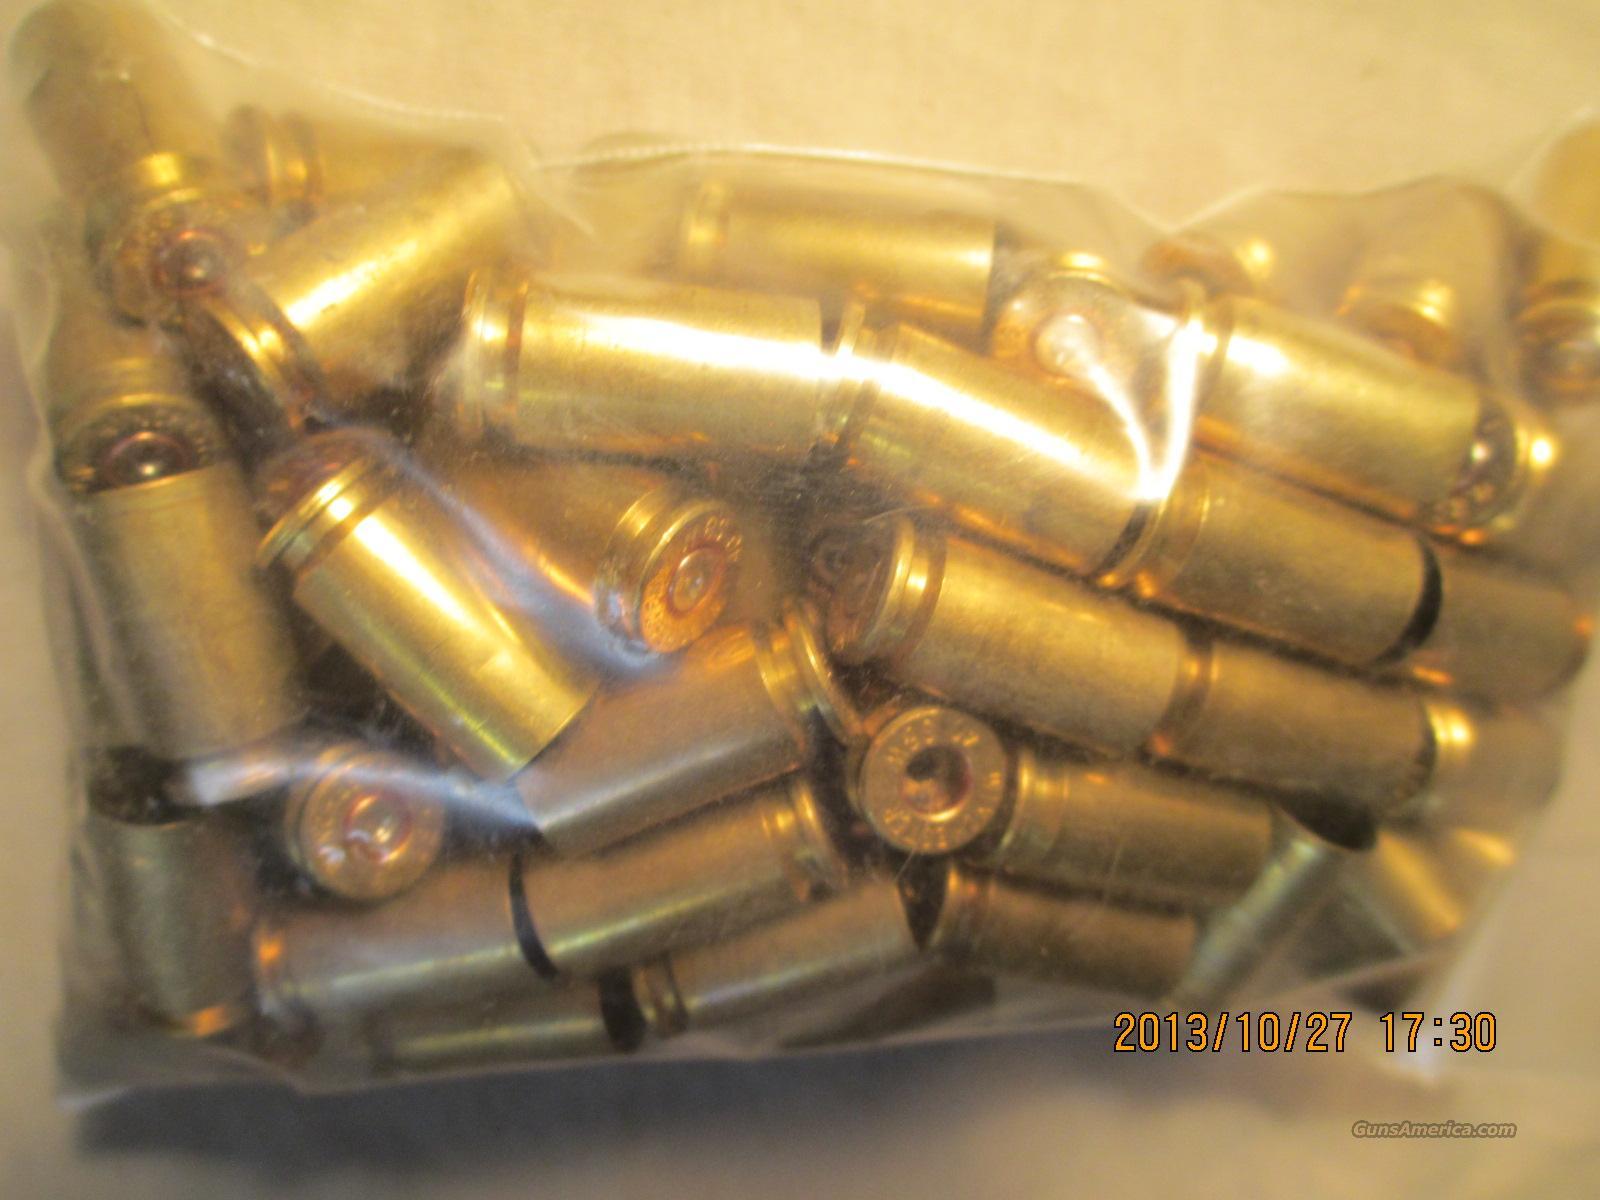 40 s&w MIXED BRASS  Non-Guns > Reloading > Components > Brass